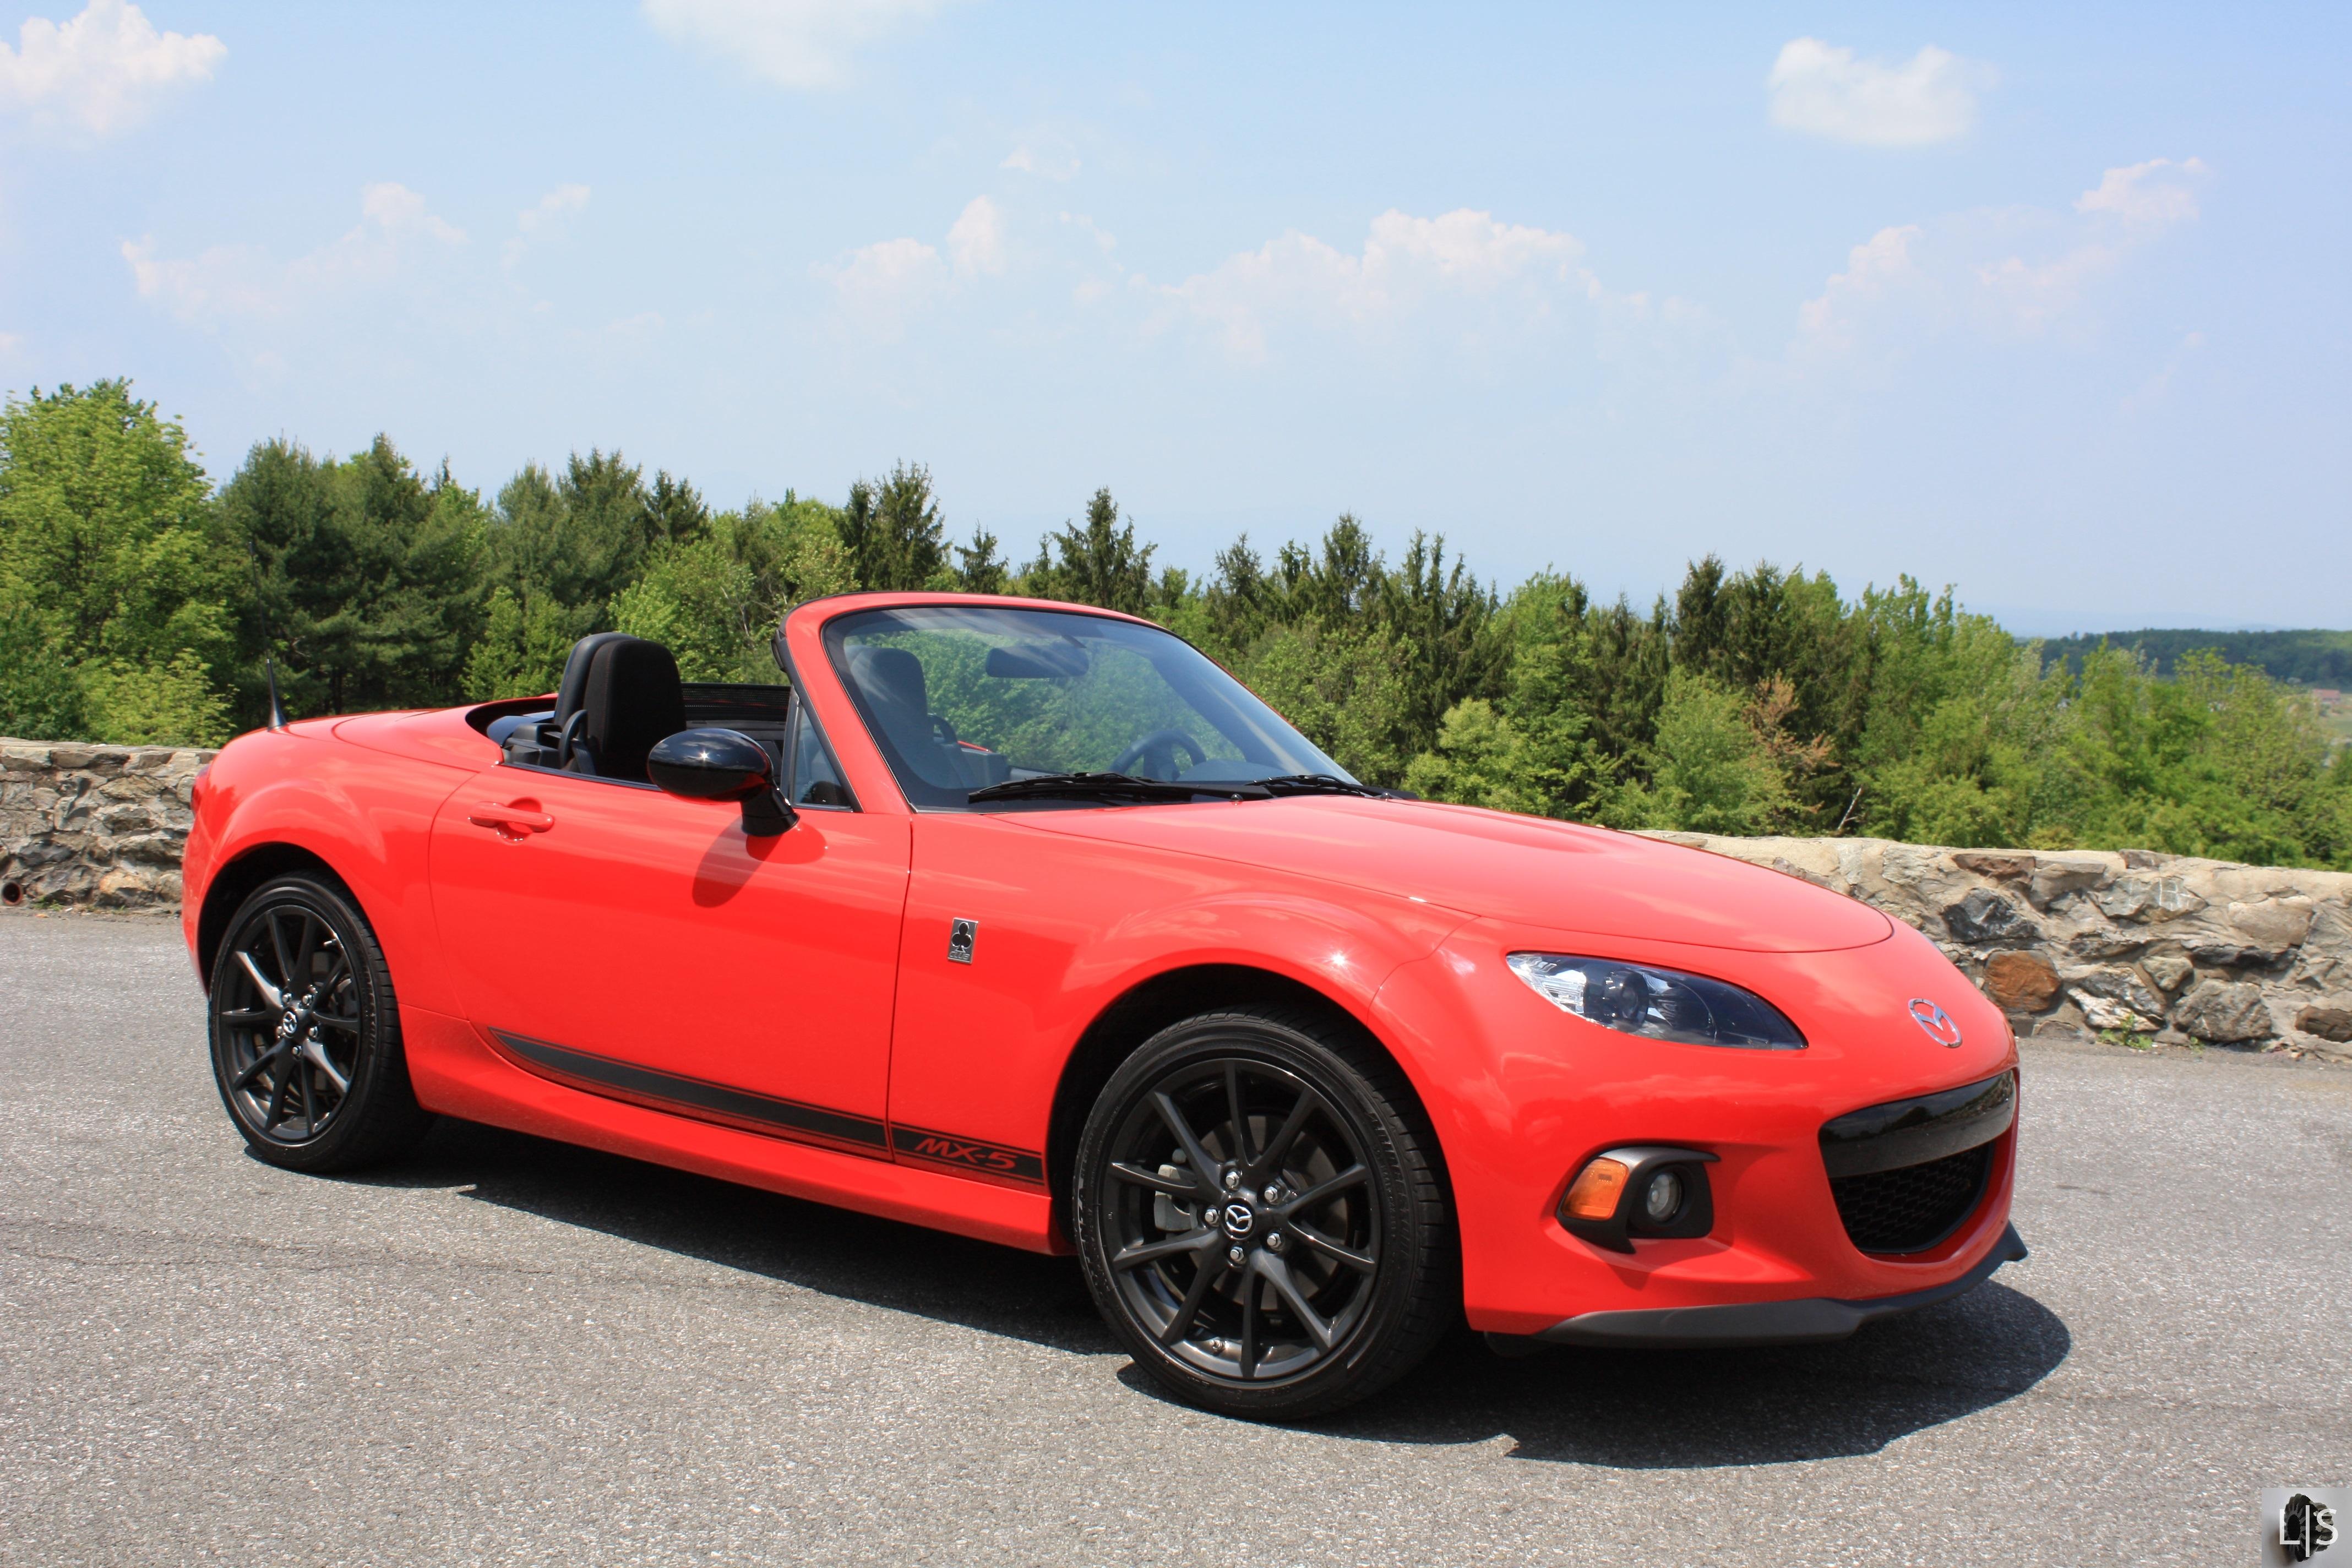 Mazda 3 Sport >> Ace of Spades: Mazda MX-5 Miata Club – Limited Slip Blog